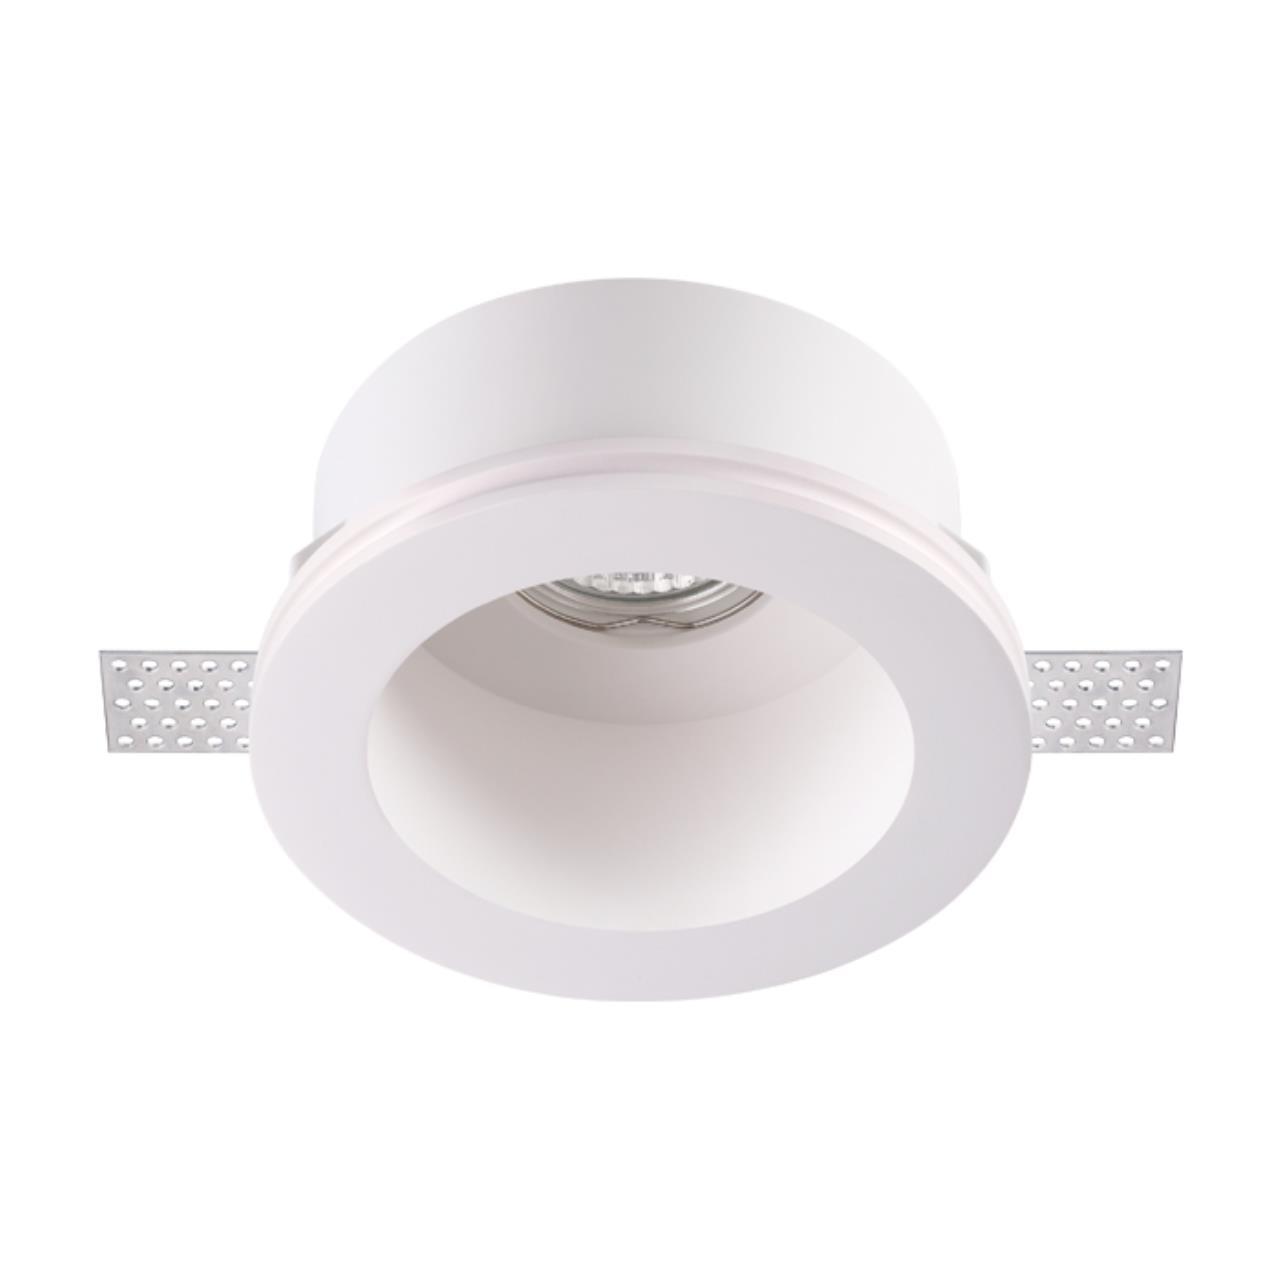 370470 SPOT NT19 042 белый Встраиваемый под покраску светильник IP20 GU10 50W 220V YESO